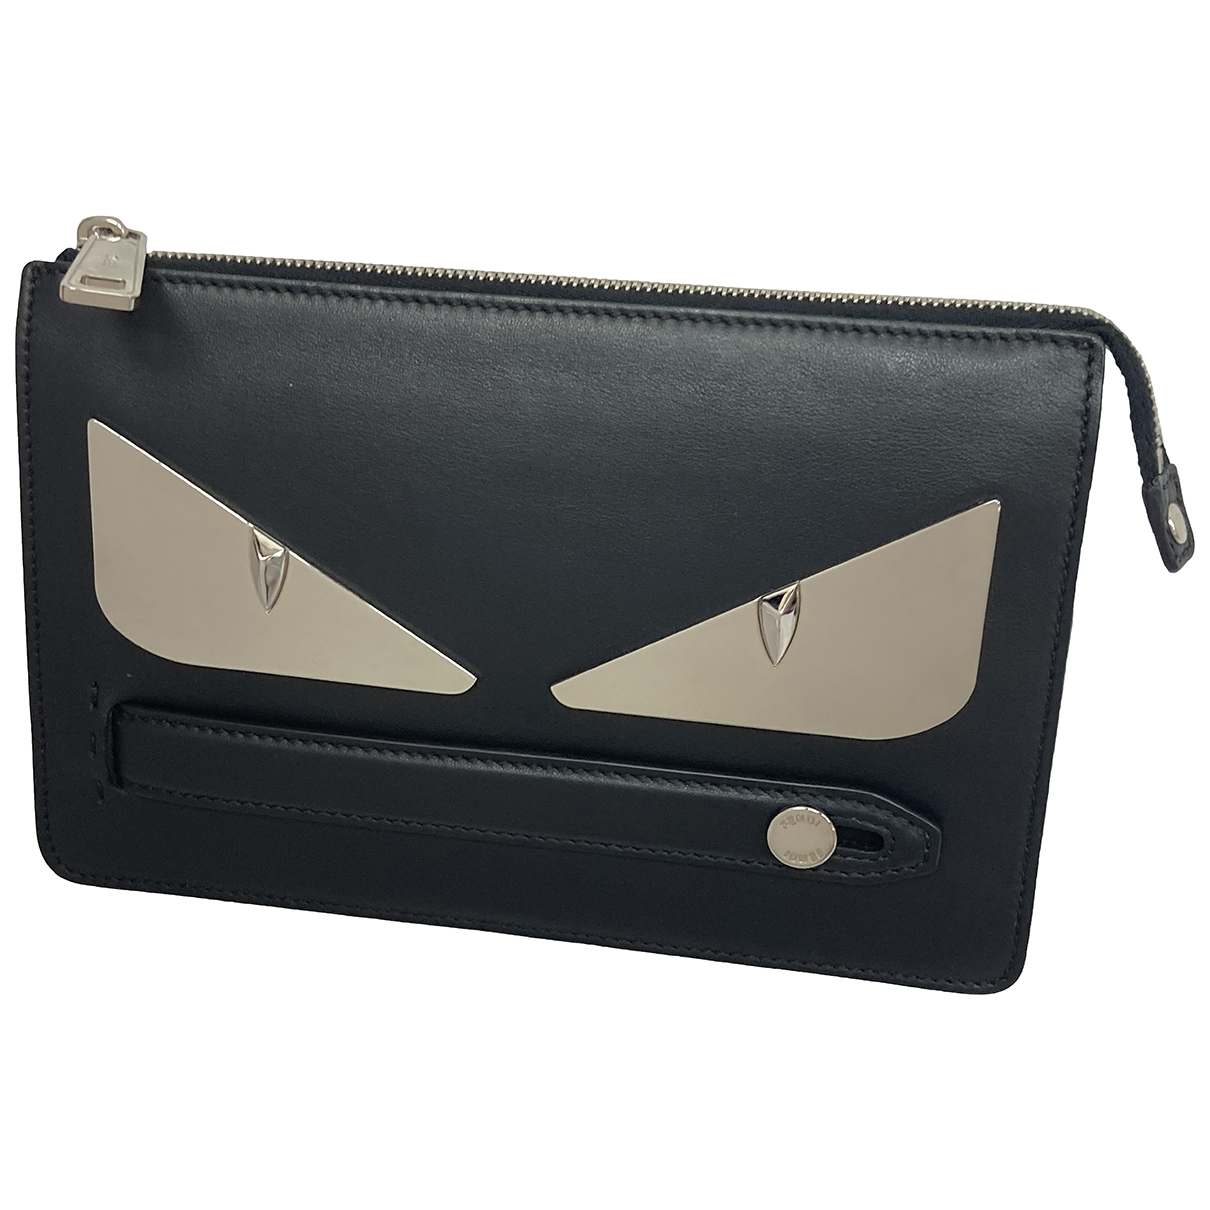 Fendi \N Black Leather Clutch bag for Women \N